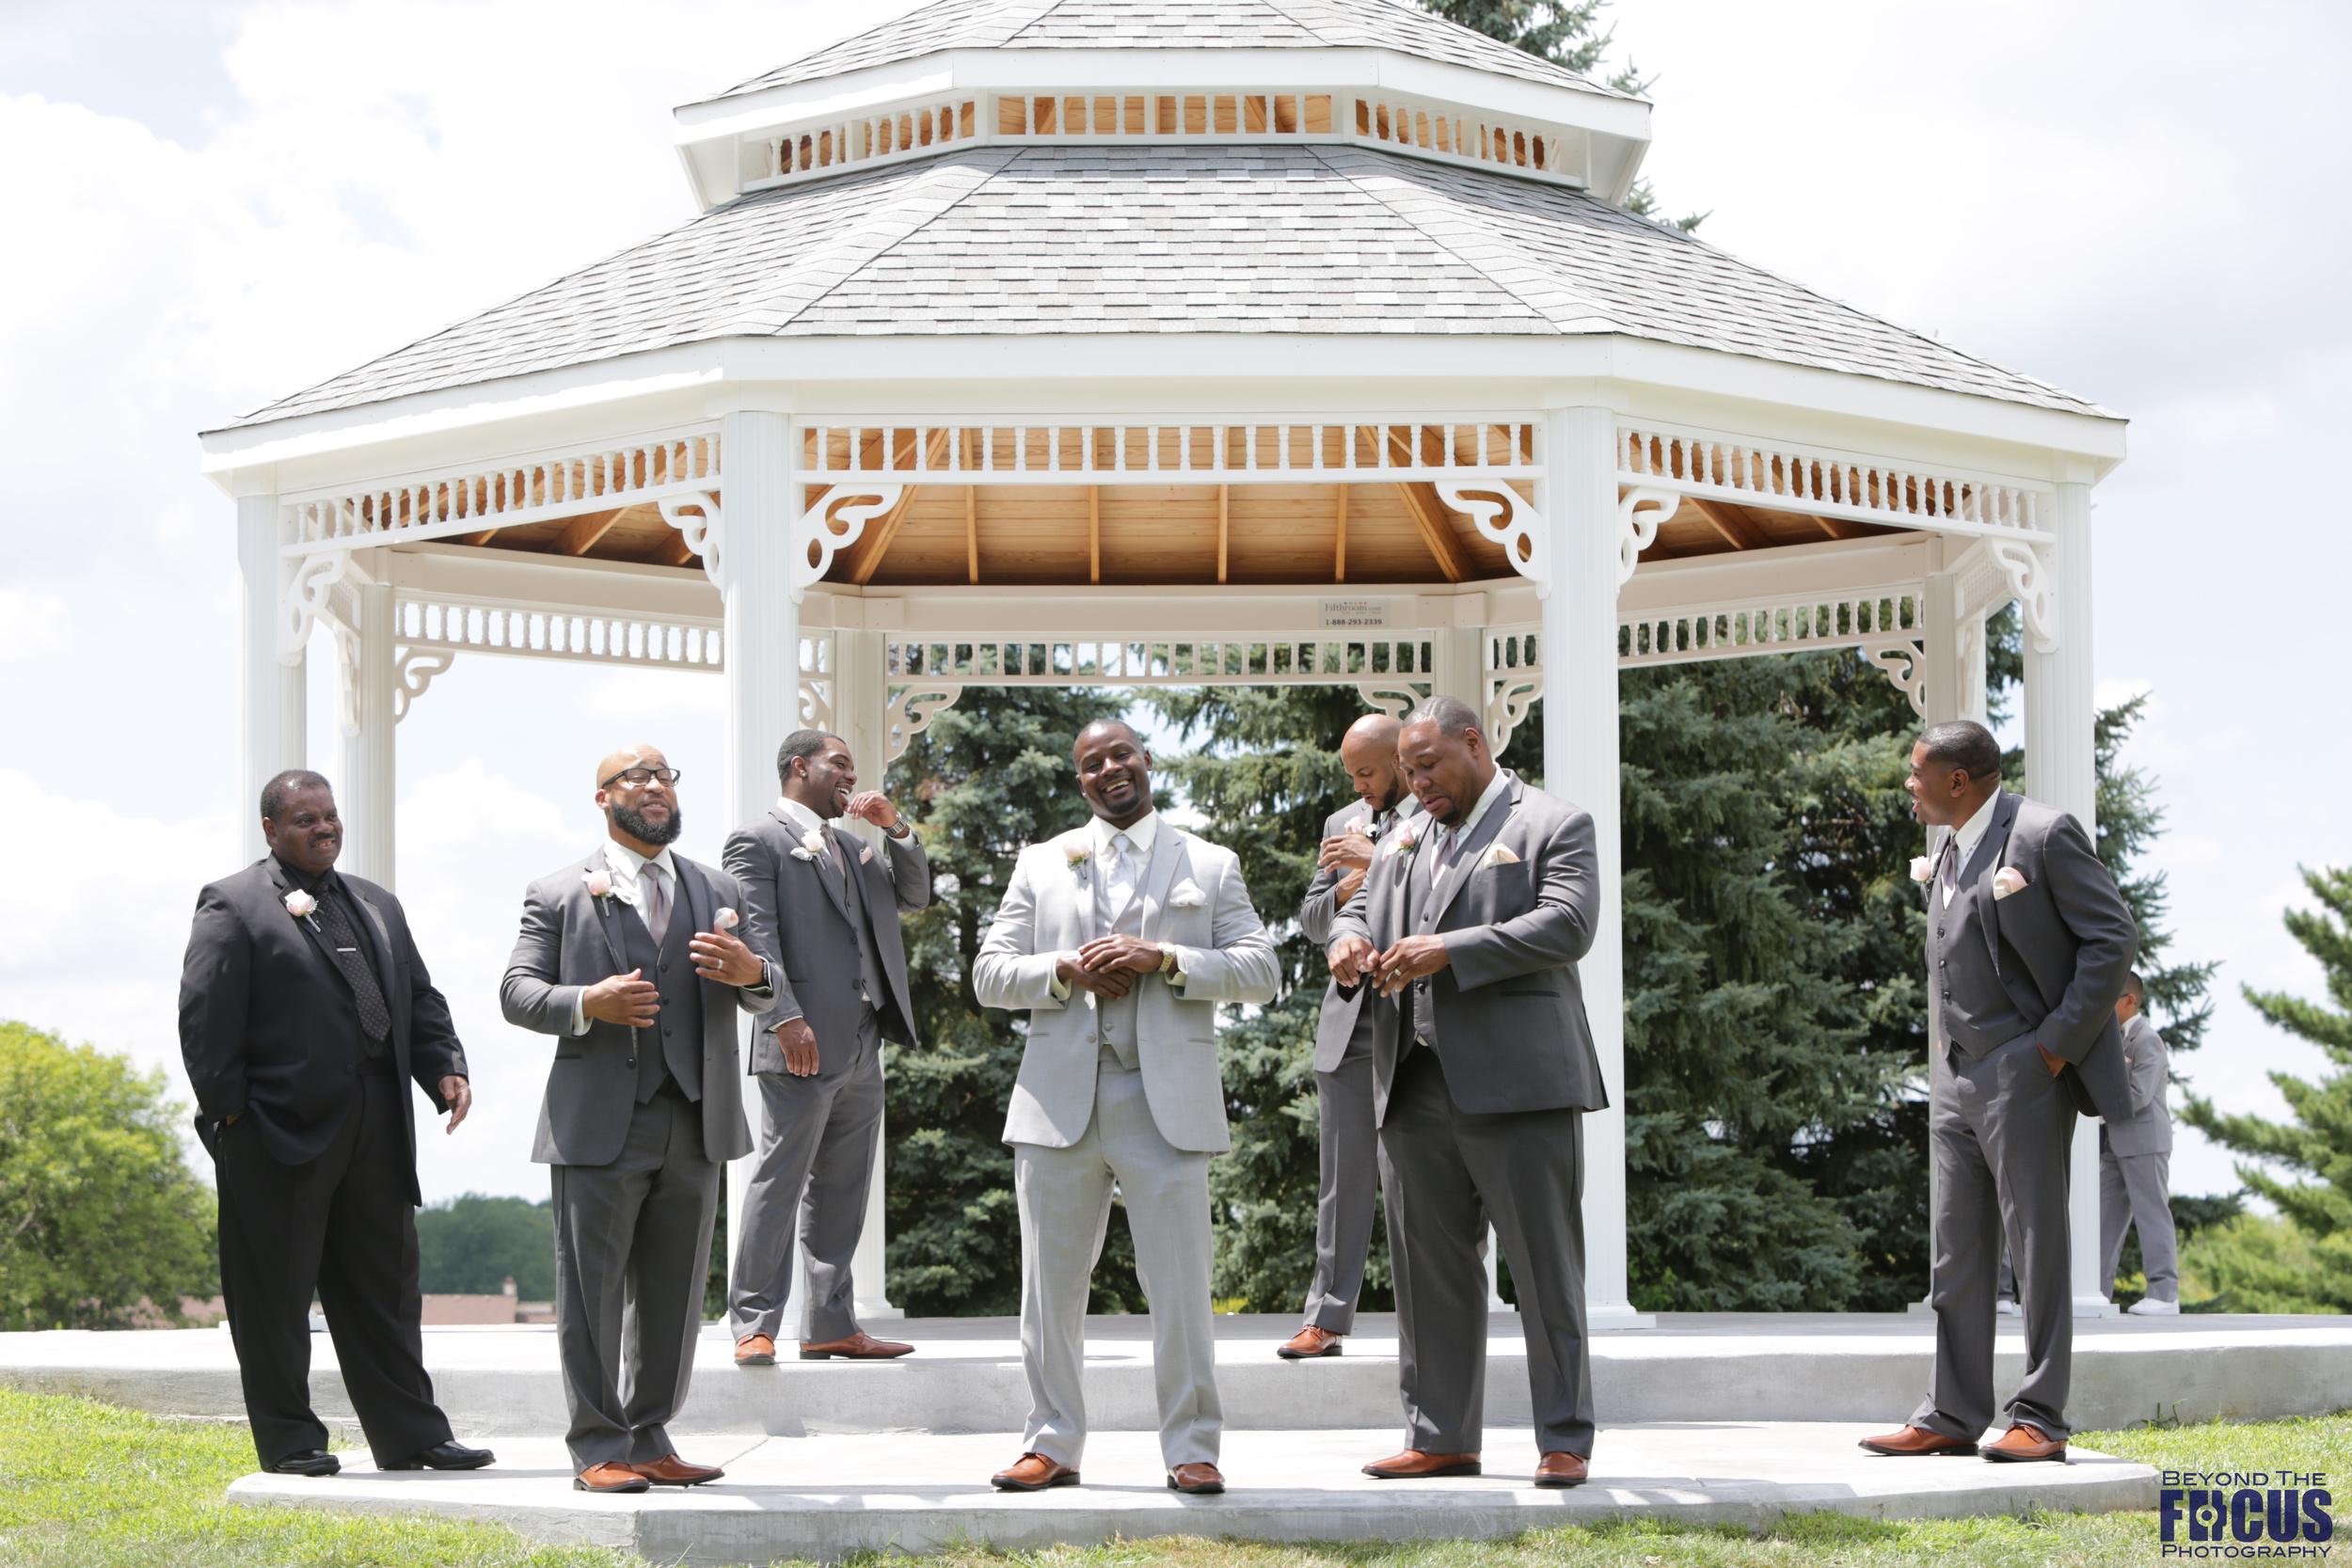 Palmer Wedding - Candids6.jpg